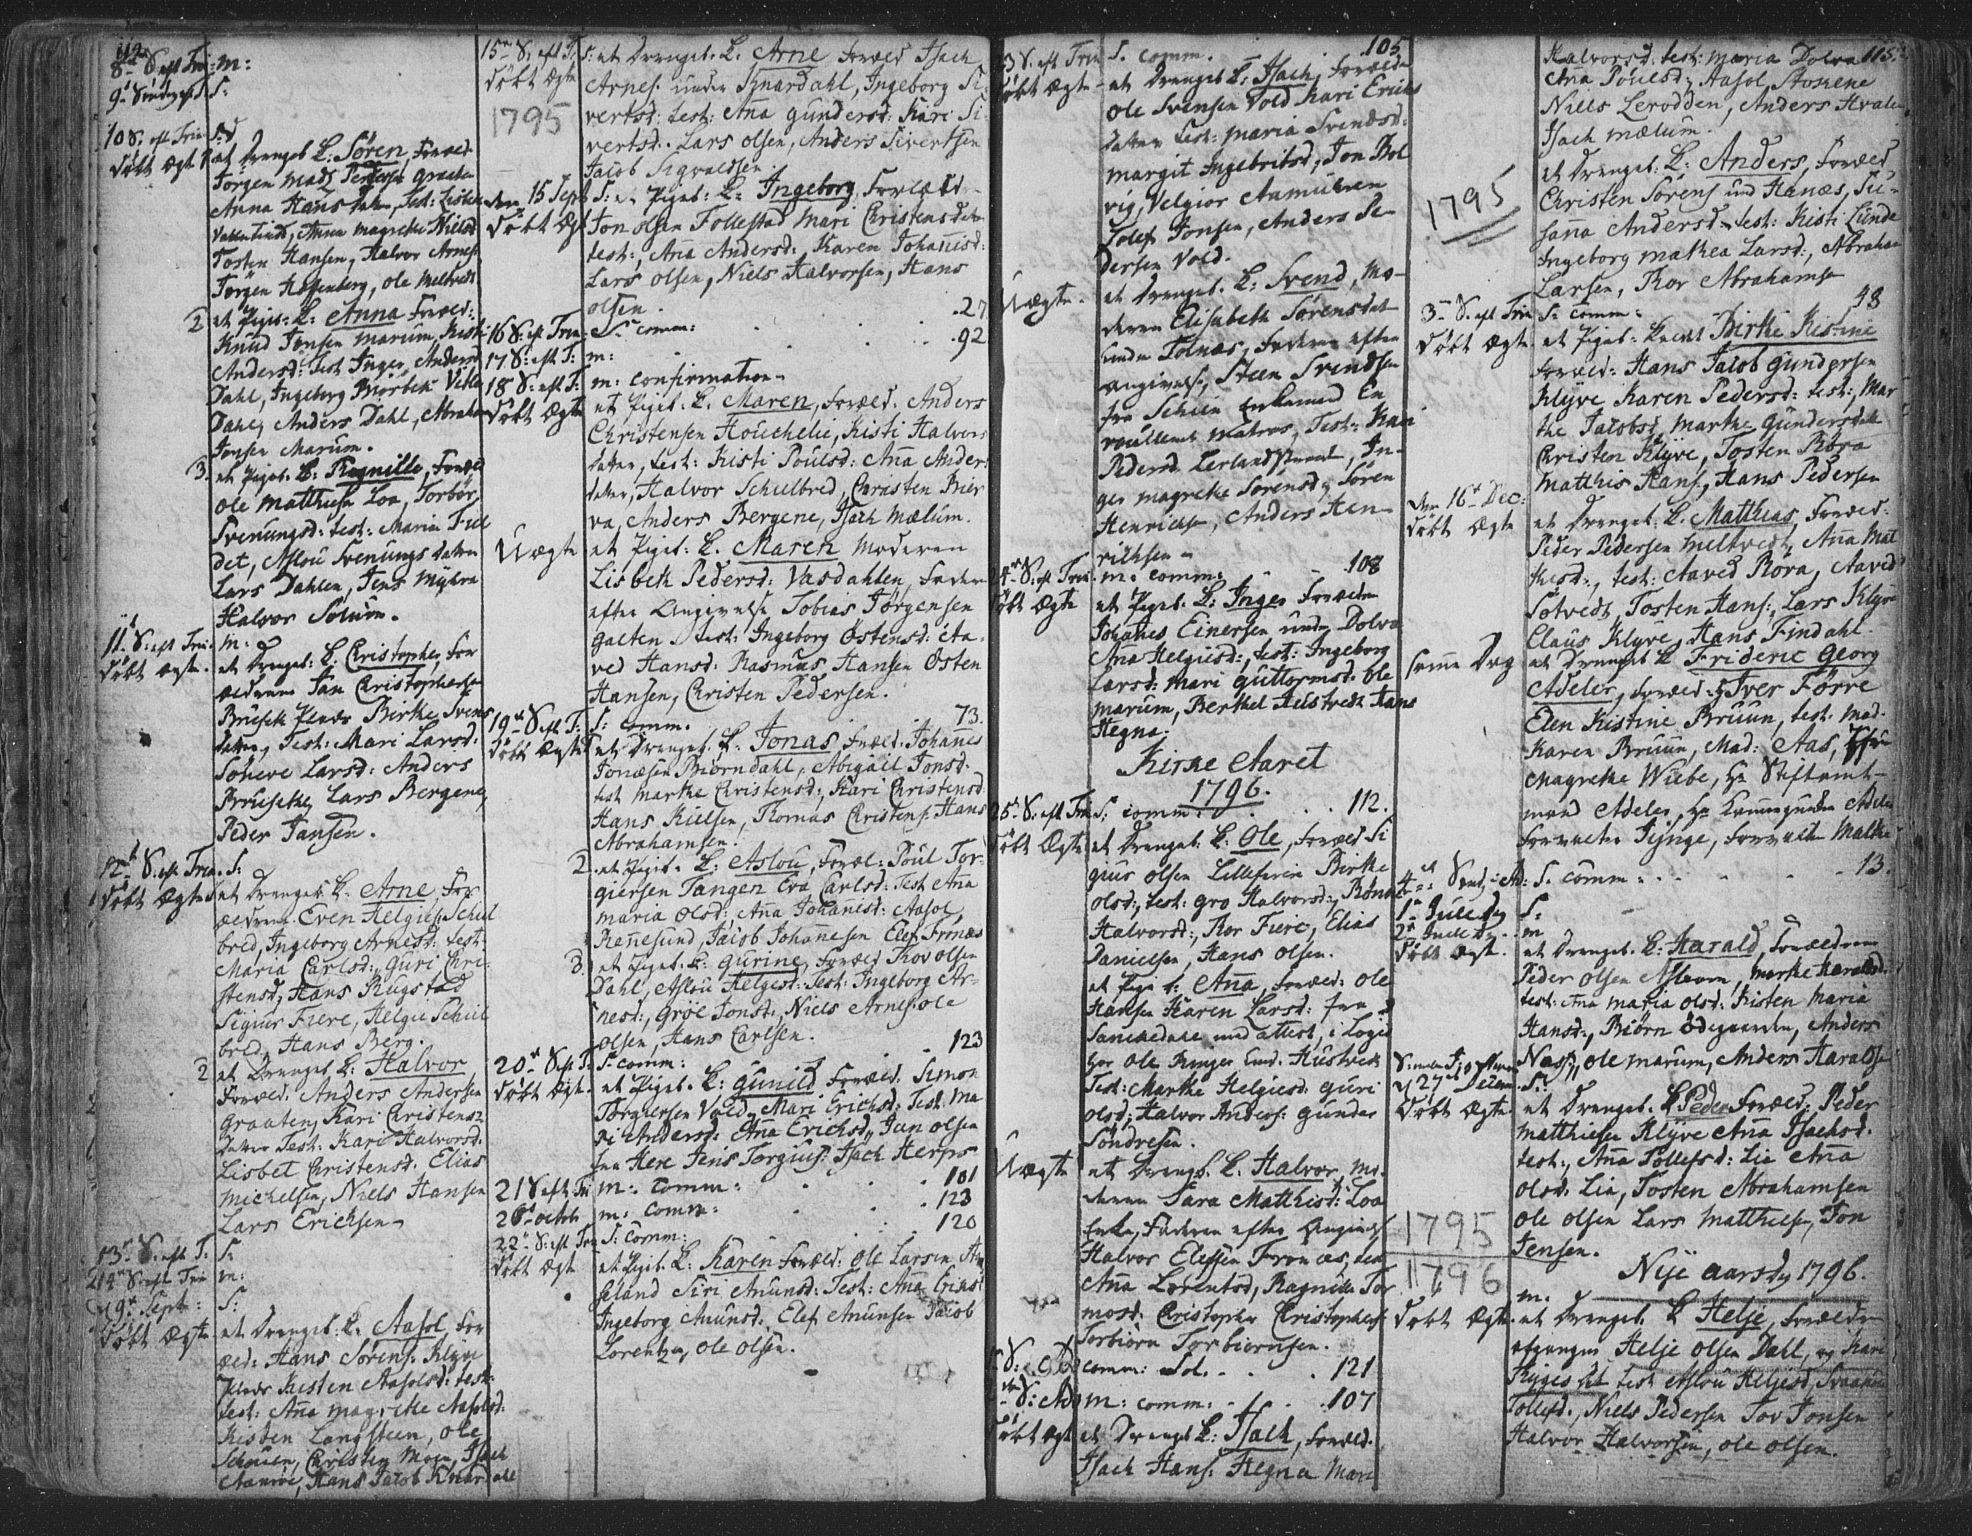 SAKO, Solum kirkebøker, F/Fa/L0003: Ministerialbok nr. I 3, 1761-1814, s. 114-115